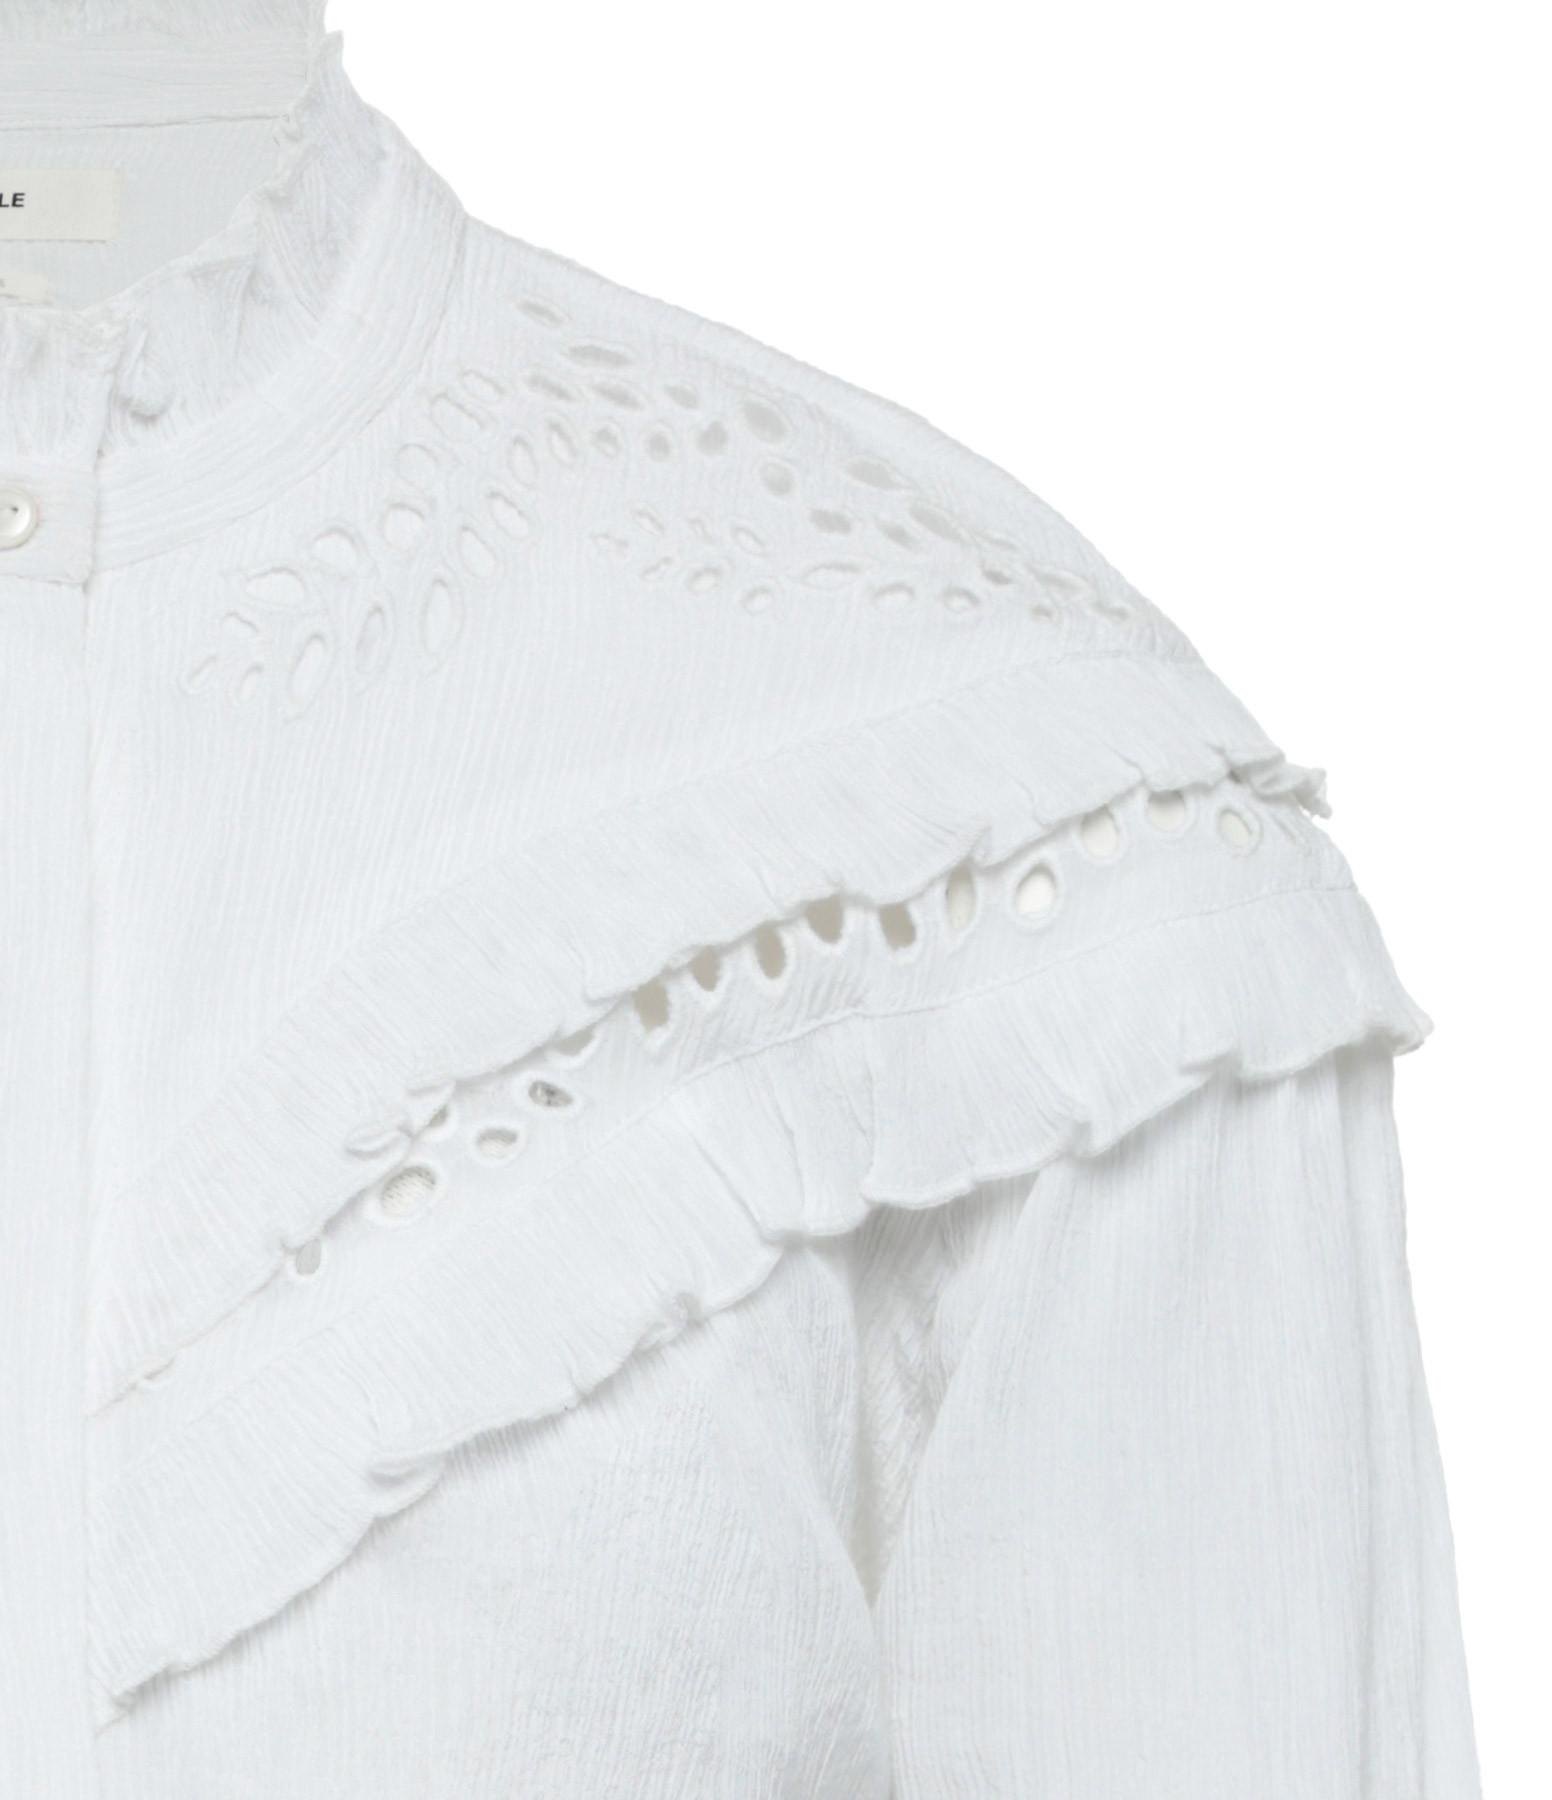 ISABEL MARANT ÉTOILE - Blouse Izae Coton Blanc